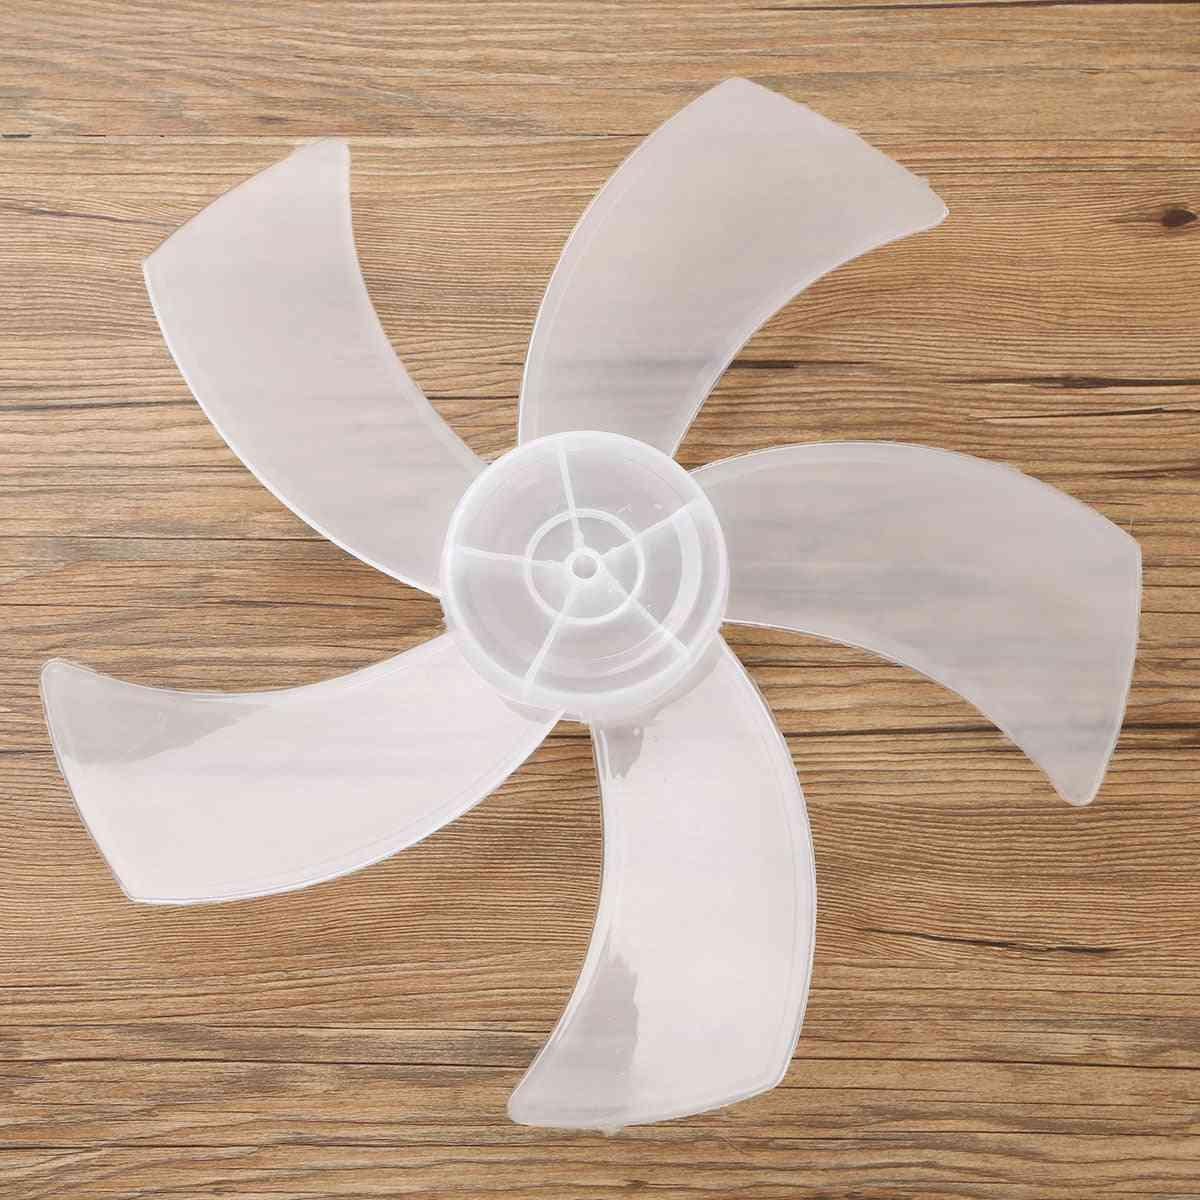 Household Ventilation Durable Plastic Fan Blade